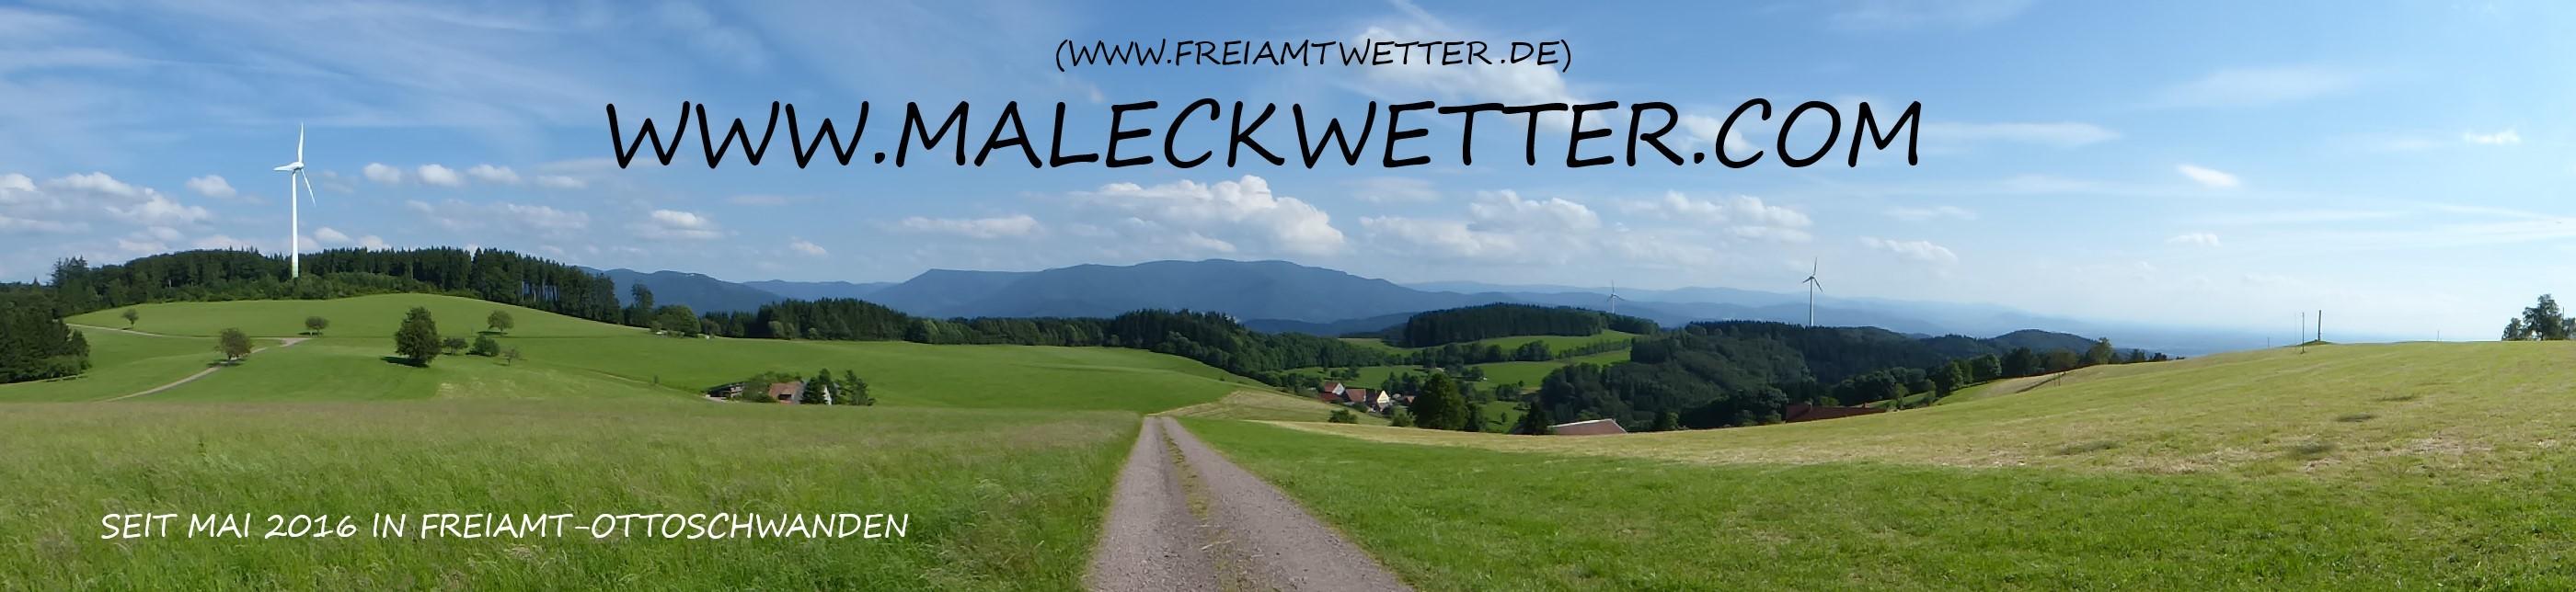 www.maleckwetter.com